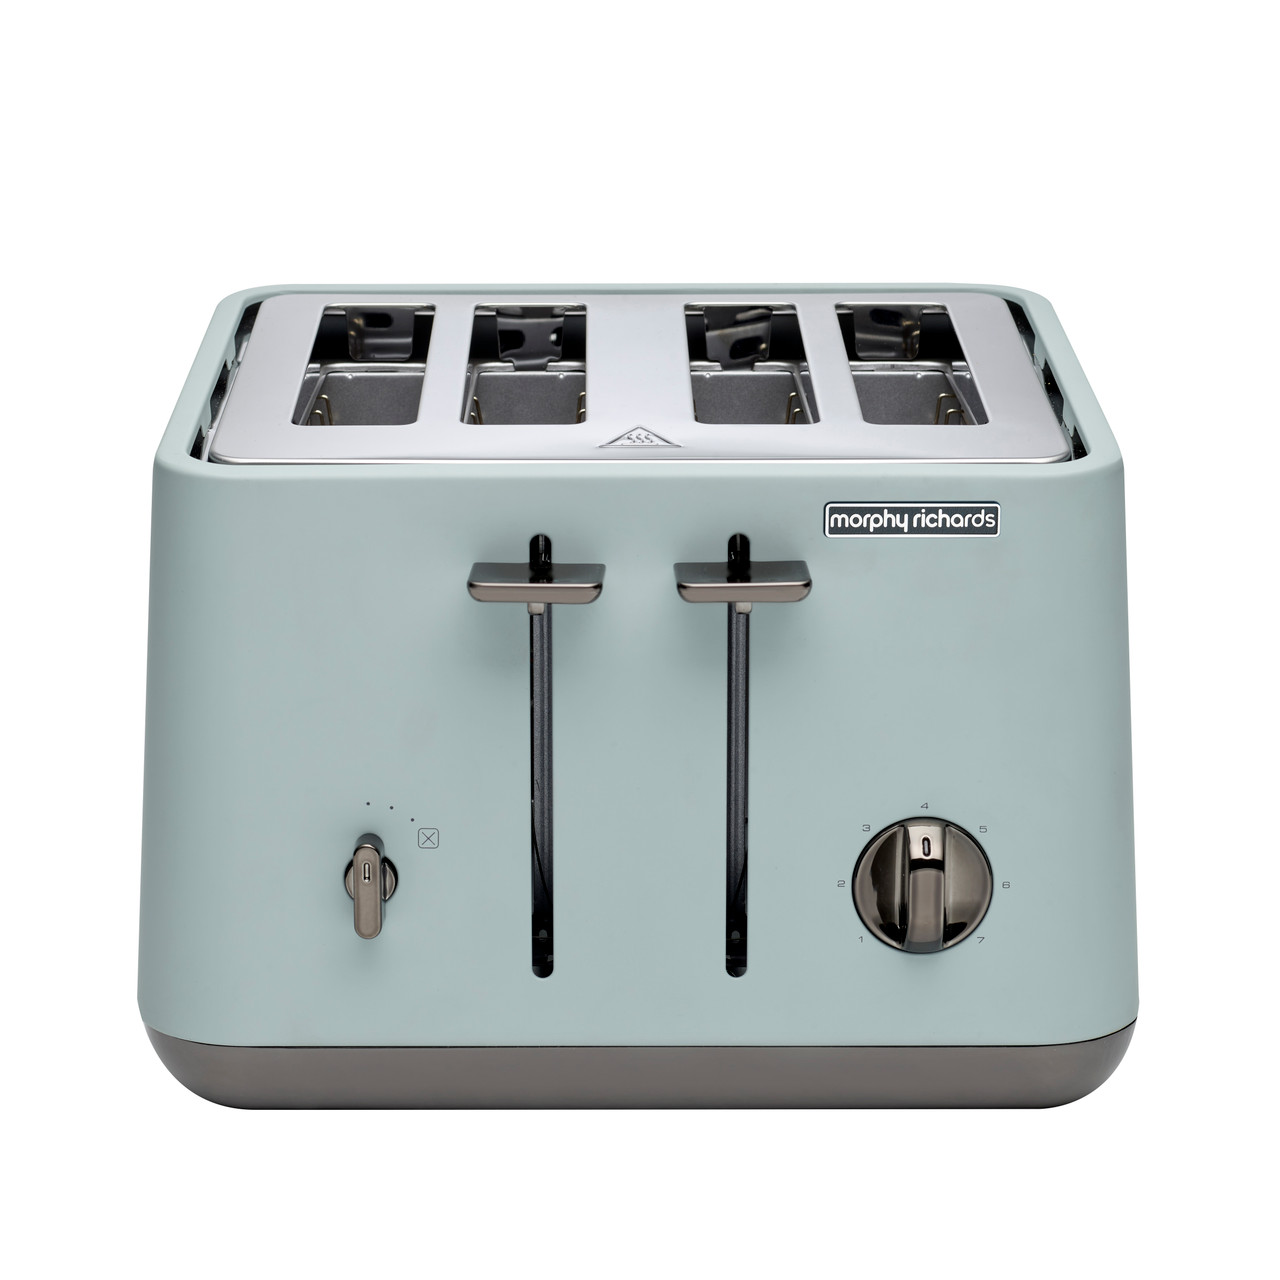 Morphy Richards 240025 Aspect Black Chrome 1880W 4 Slice Toaster – Willow Green